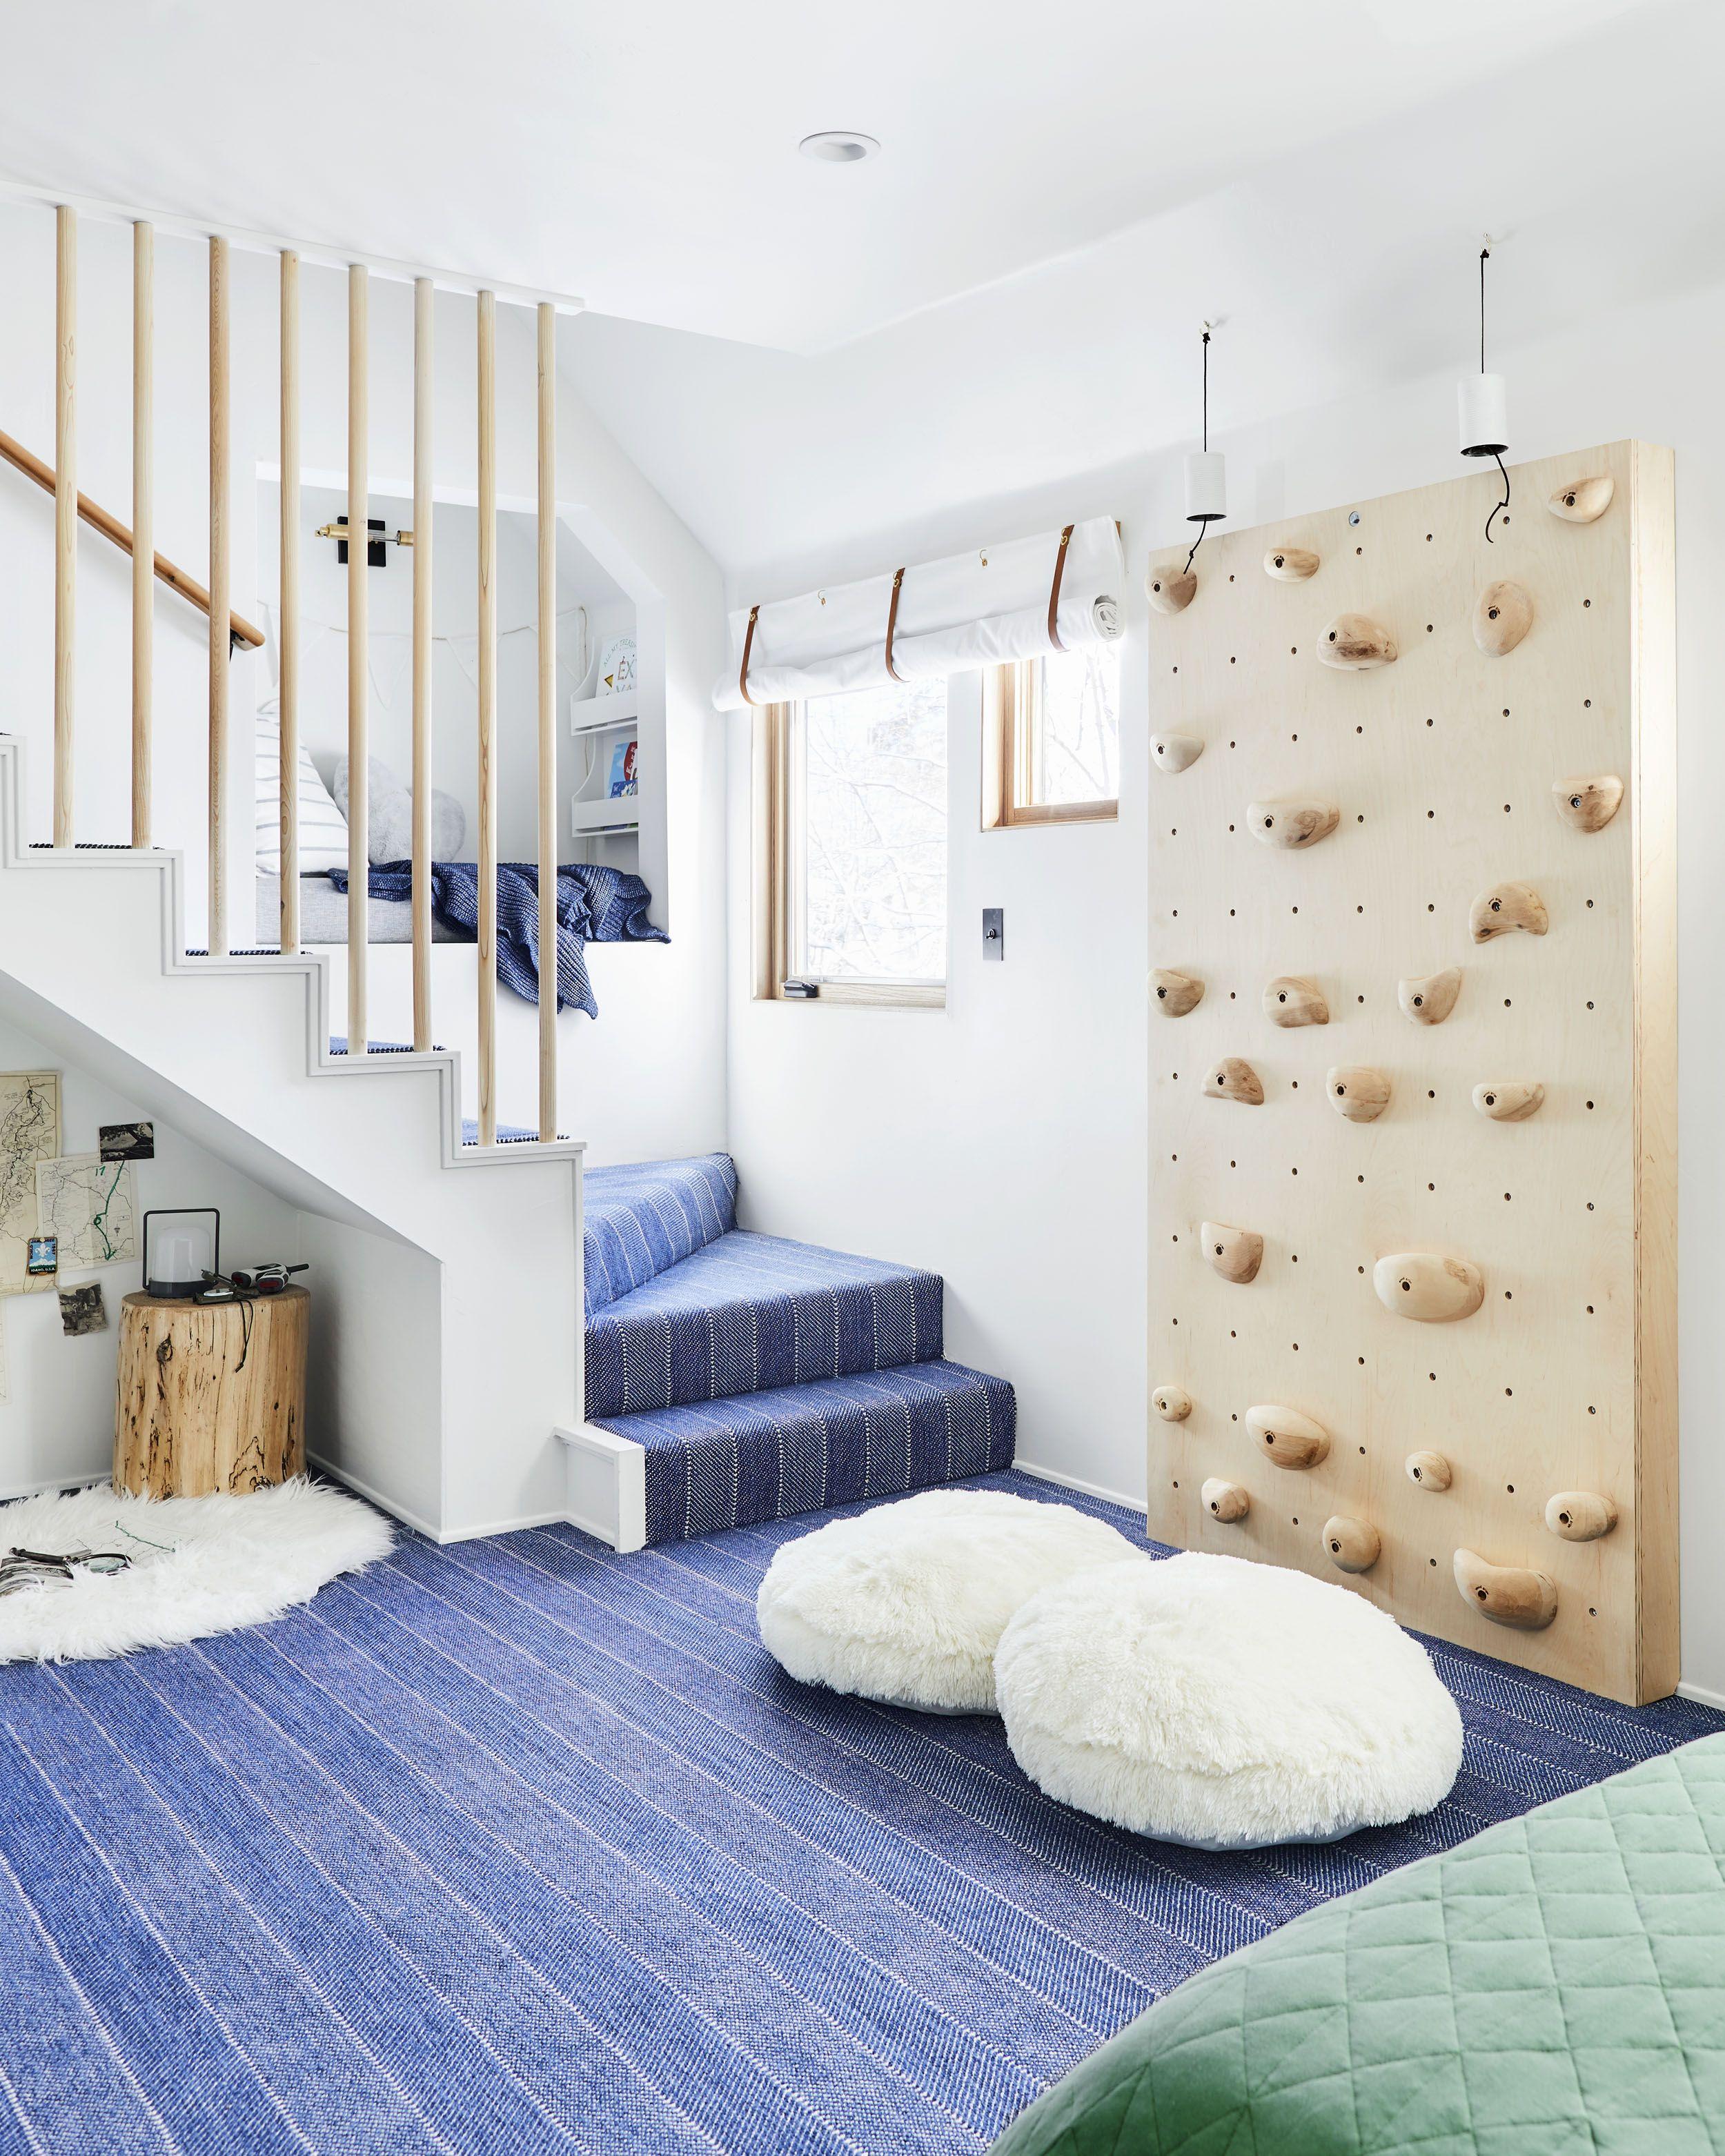 Shared Boys Geometrical Bedroom: How We Designed An Adventure-Themed Shared Boy & Girl